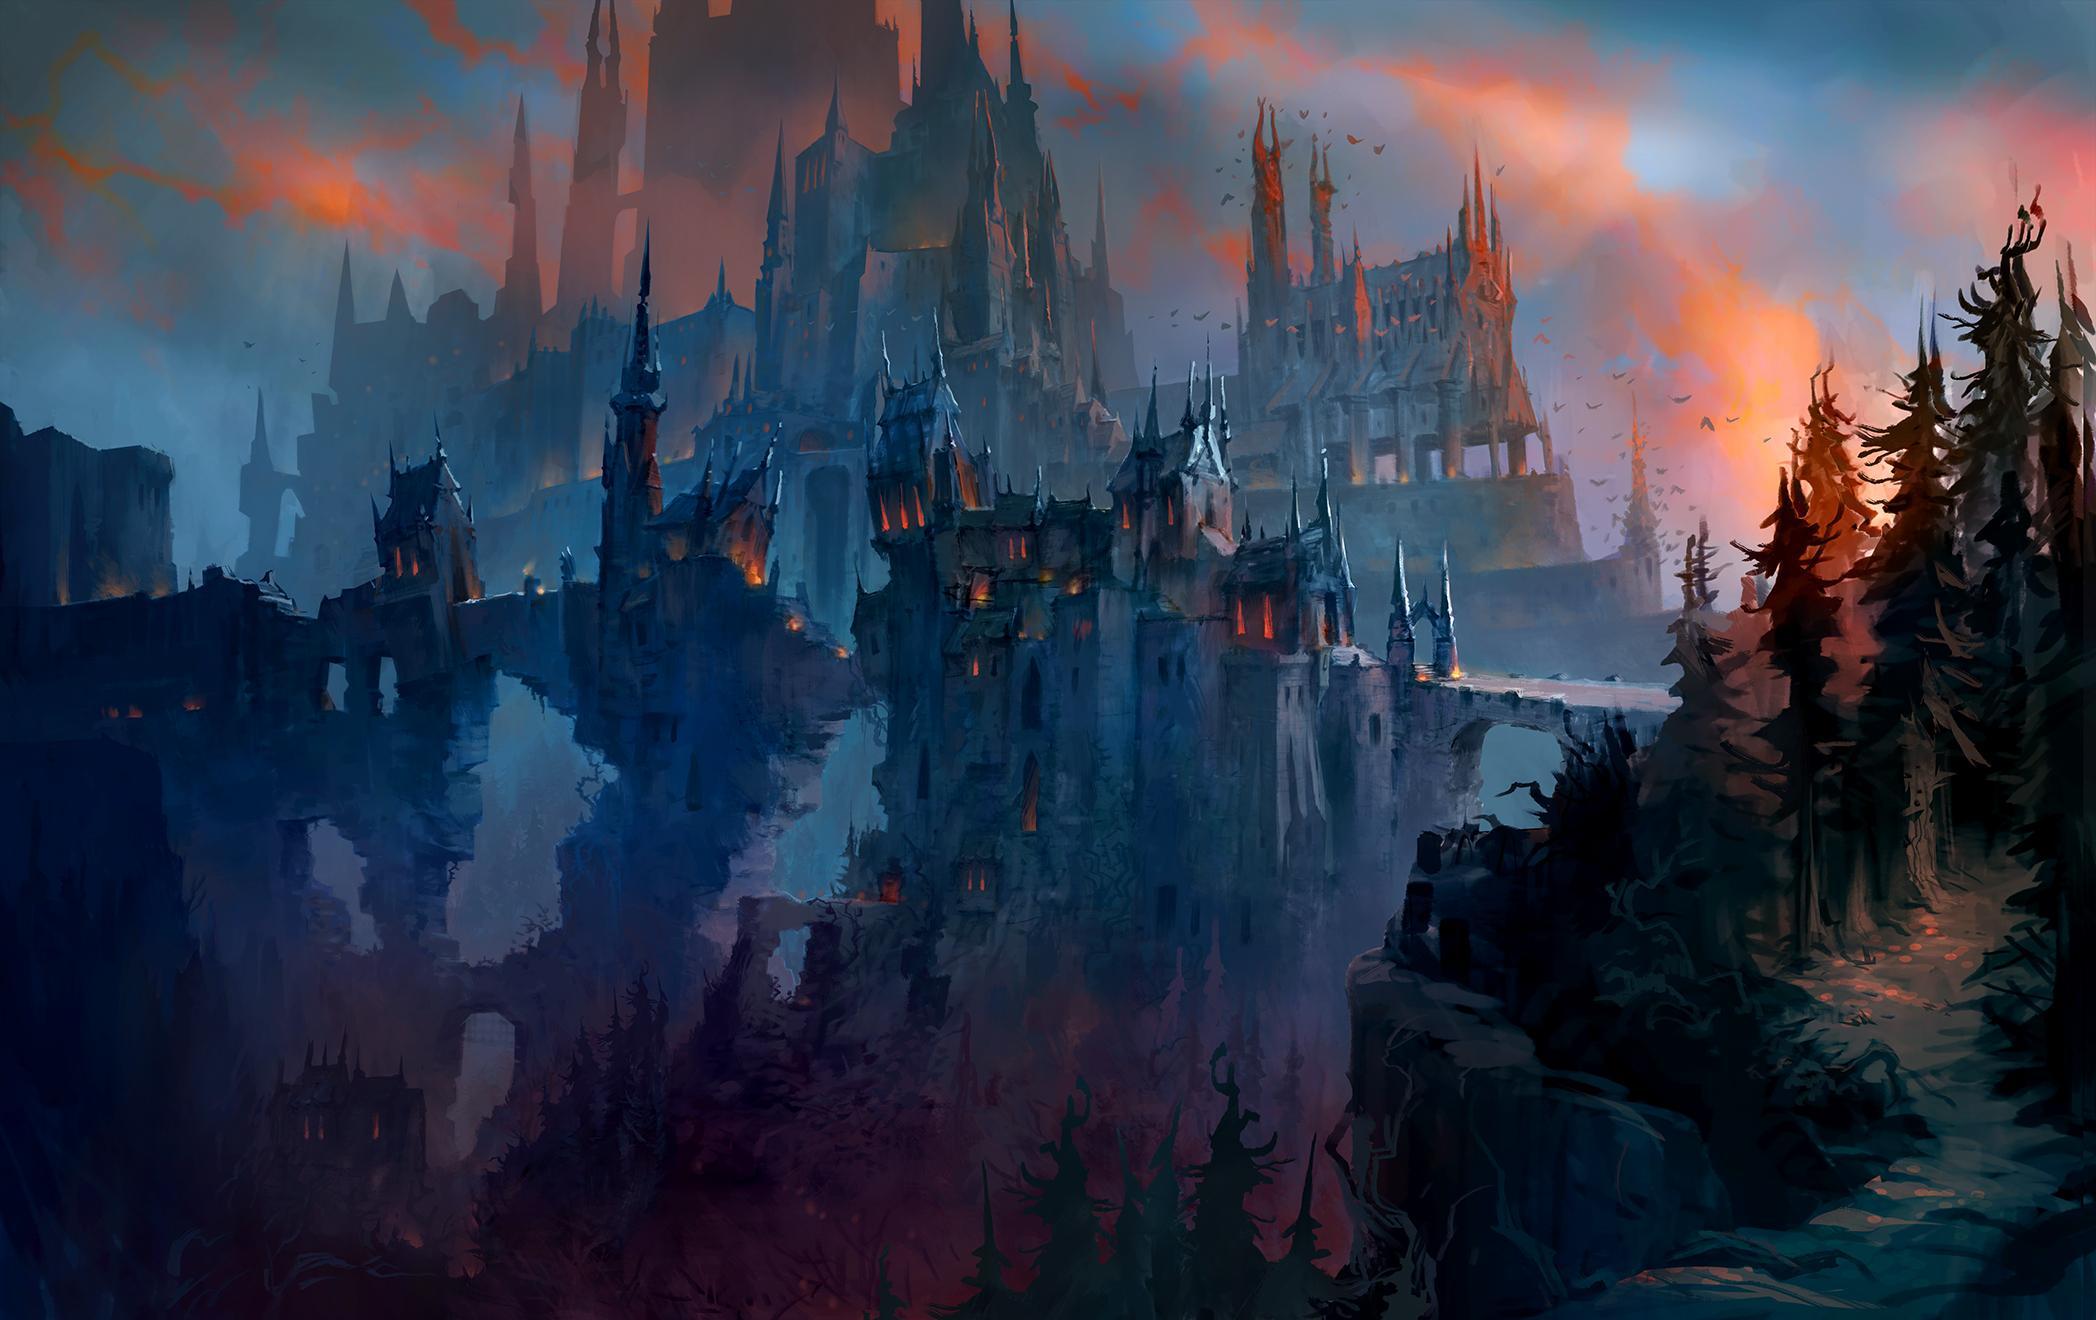 Premier raid de Shadowlands : Château Nathria dans World of Warcraft